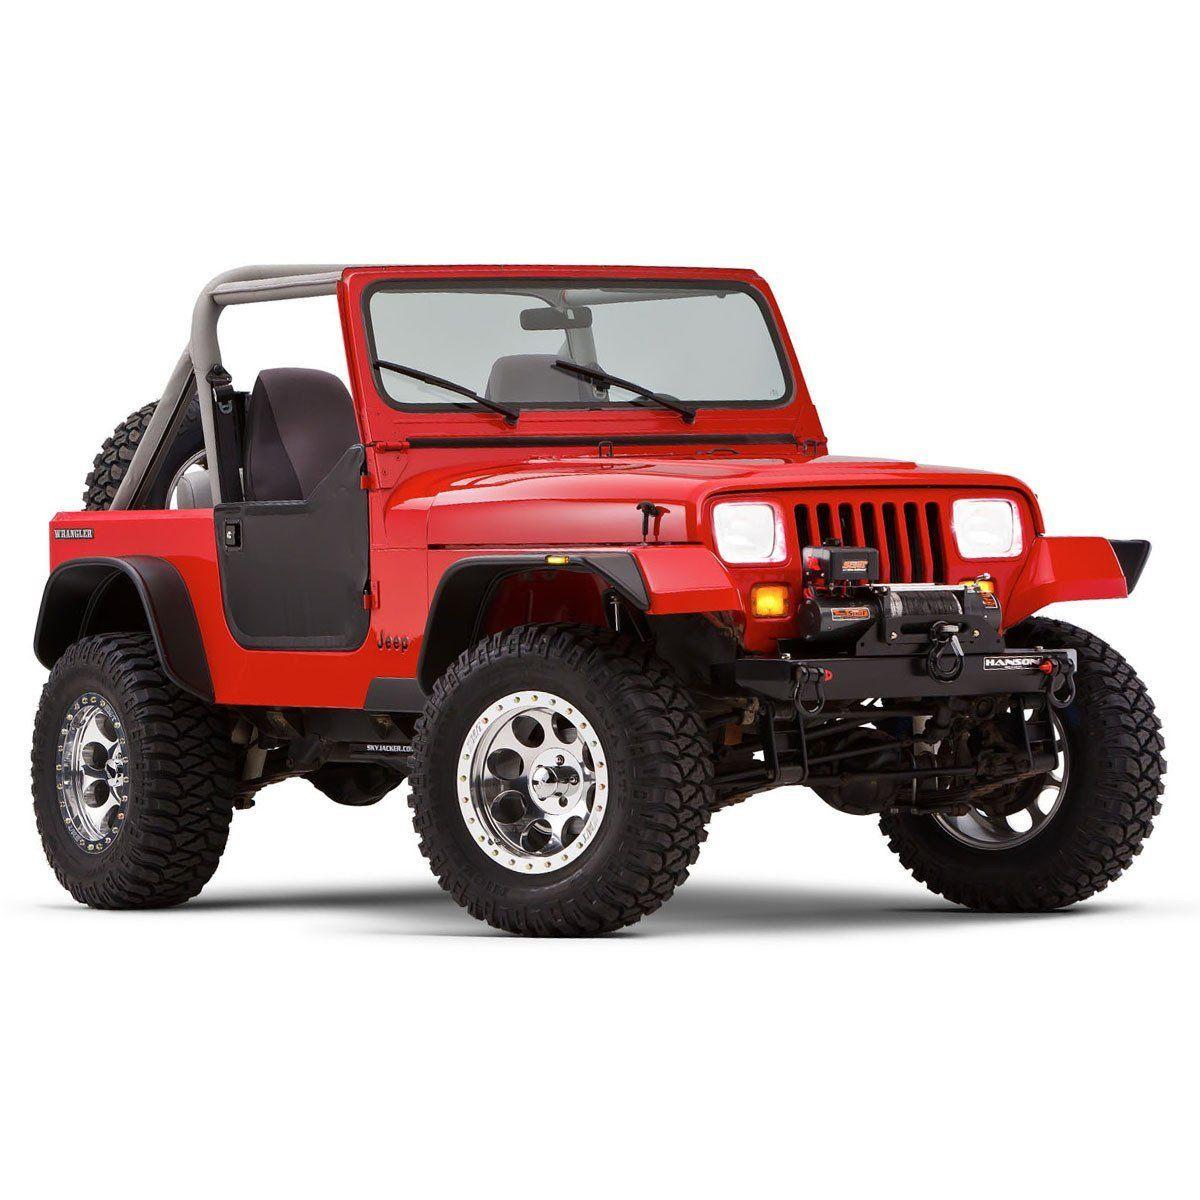 Pin By Matt Honner On My Kinda Jeep S Olllllllo In 2020 Jeep